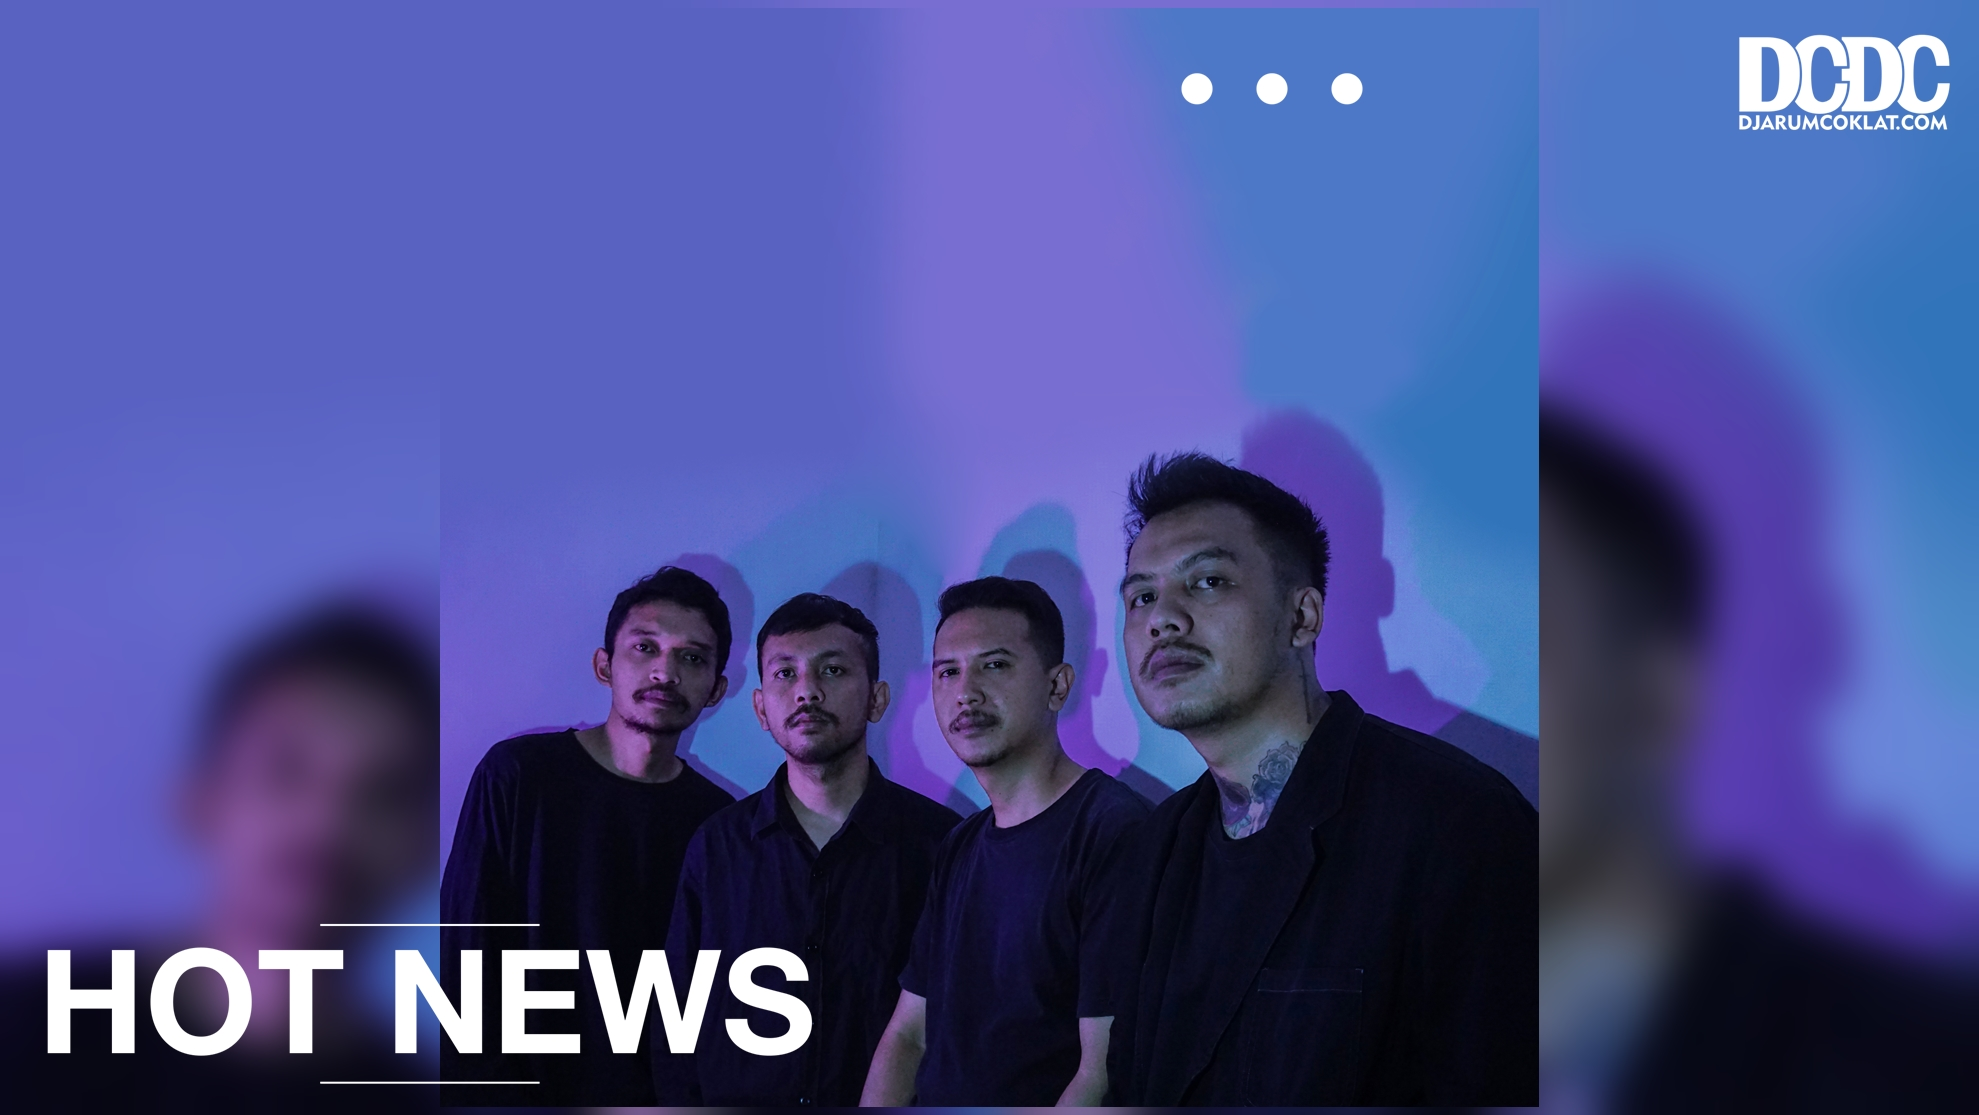 Octopus, Si Gurita Rock yang Albumnya Terganjal Pandemi Akhirnya Rilis EP 'Melodramatic'